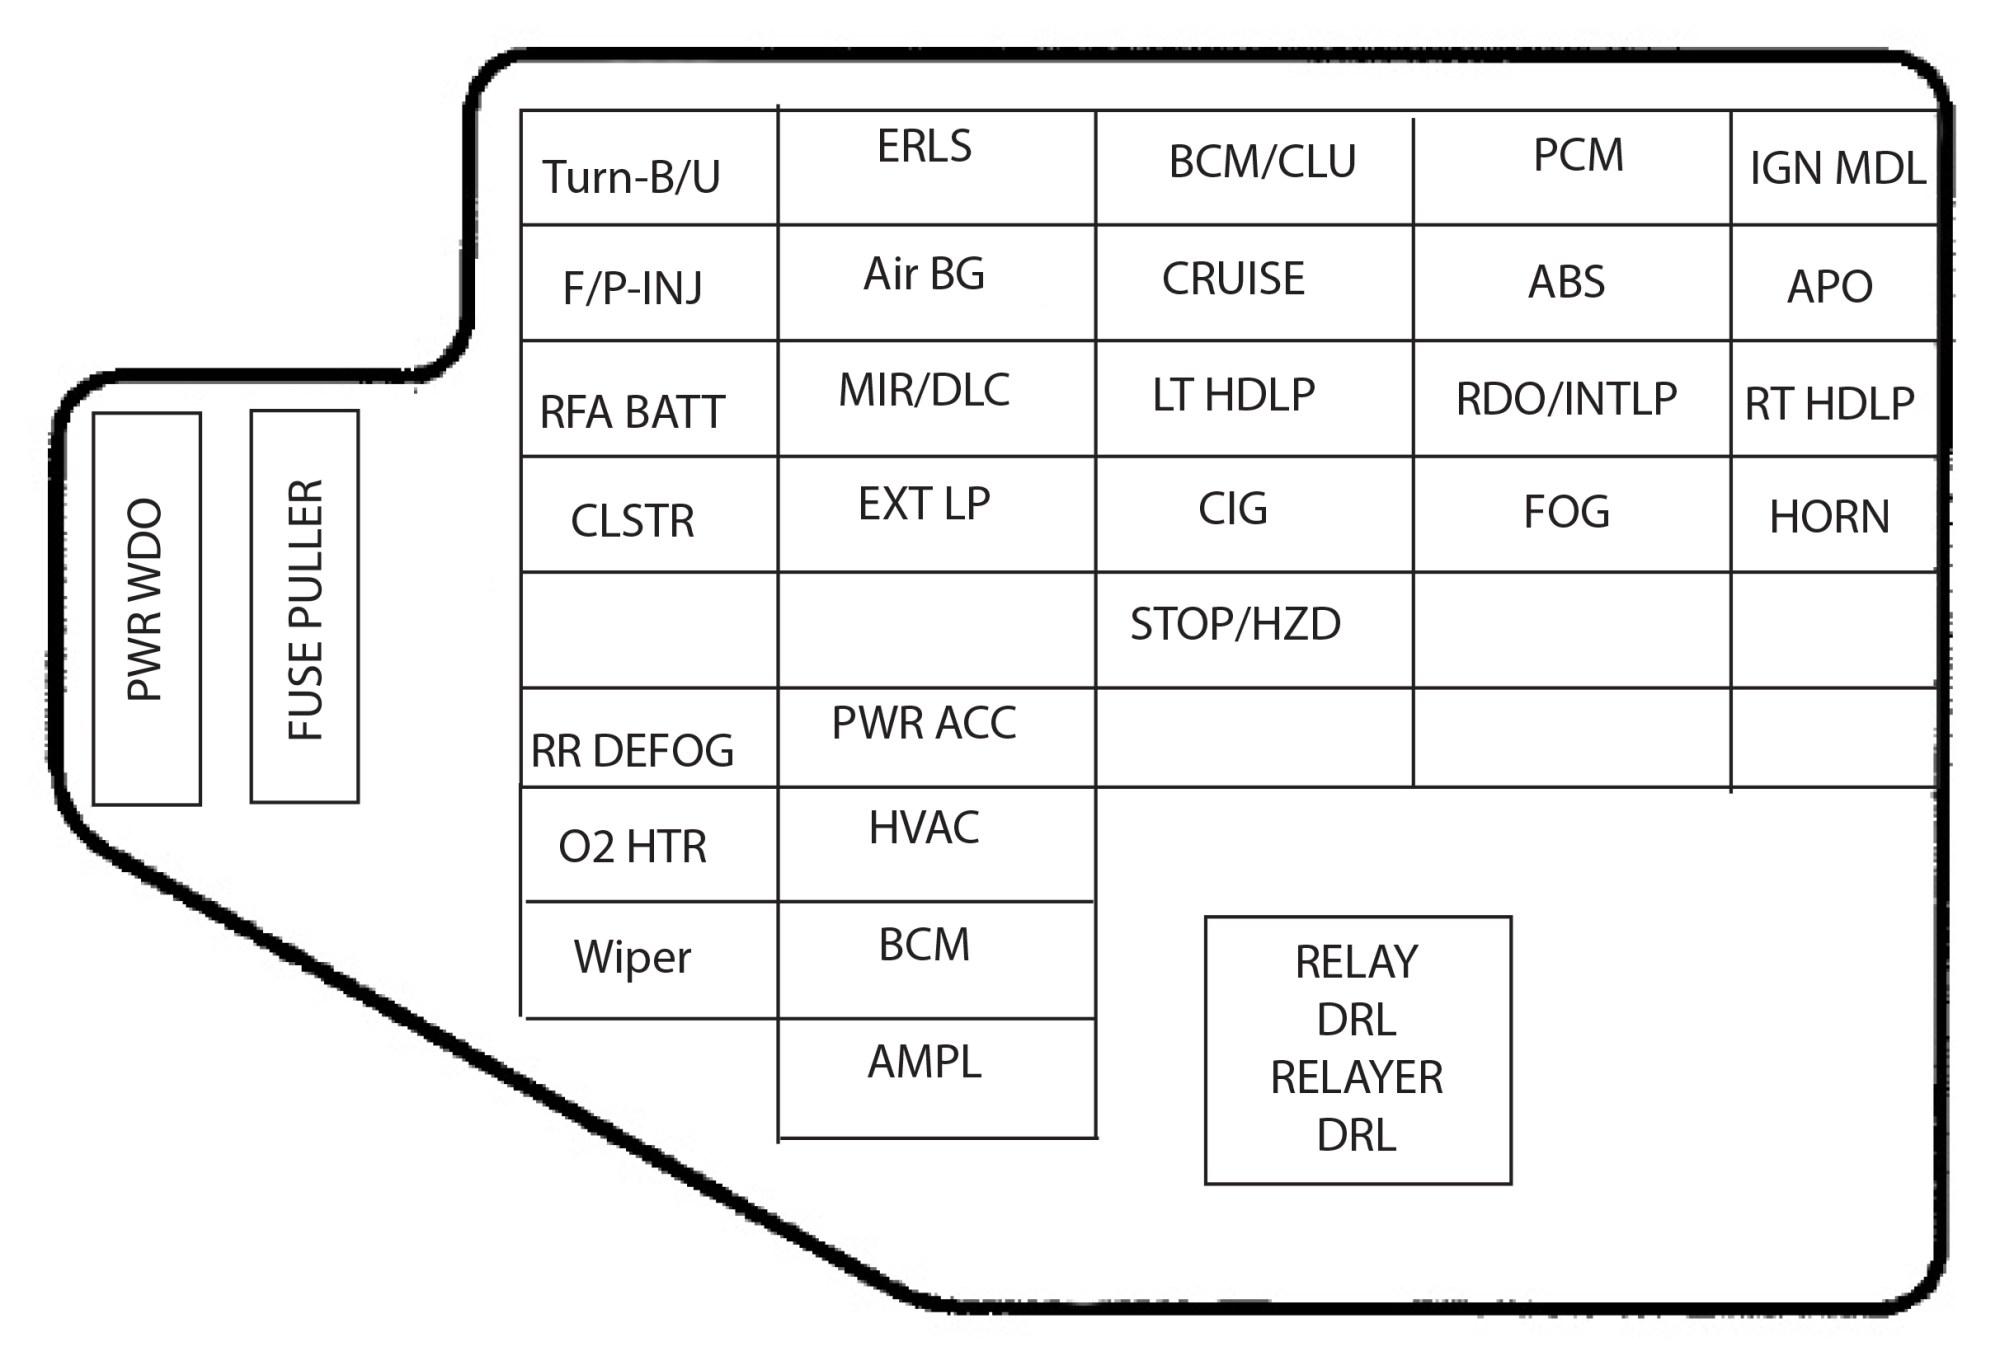 hight resolution of 2004 chevrolet cavalier fuse diagram ricks free auto repair advice ricks free auto repair advice automotive repair tips and how to